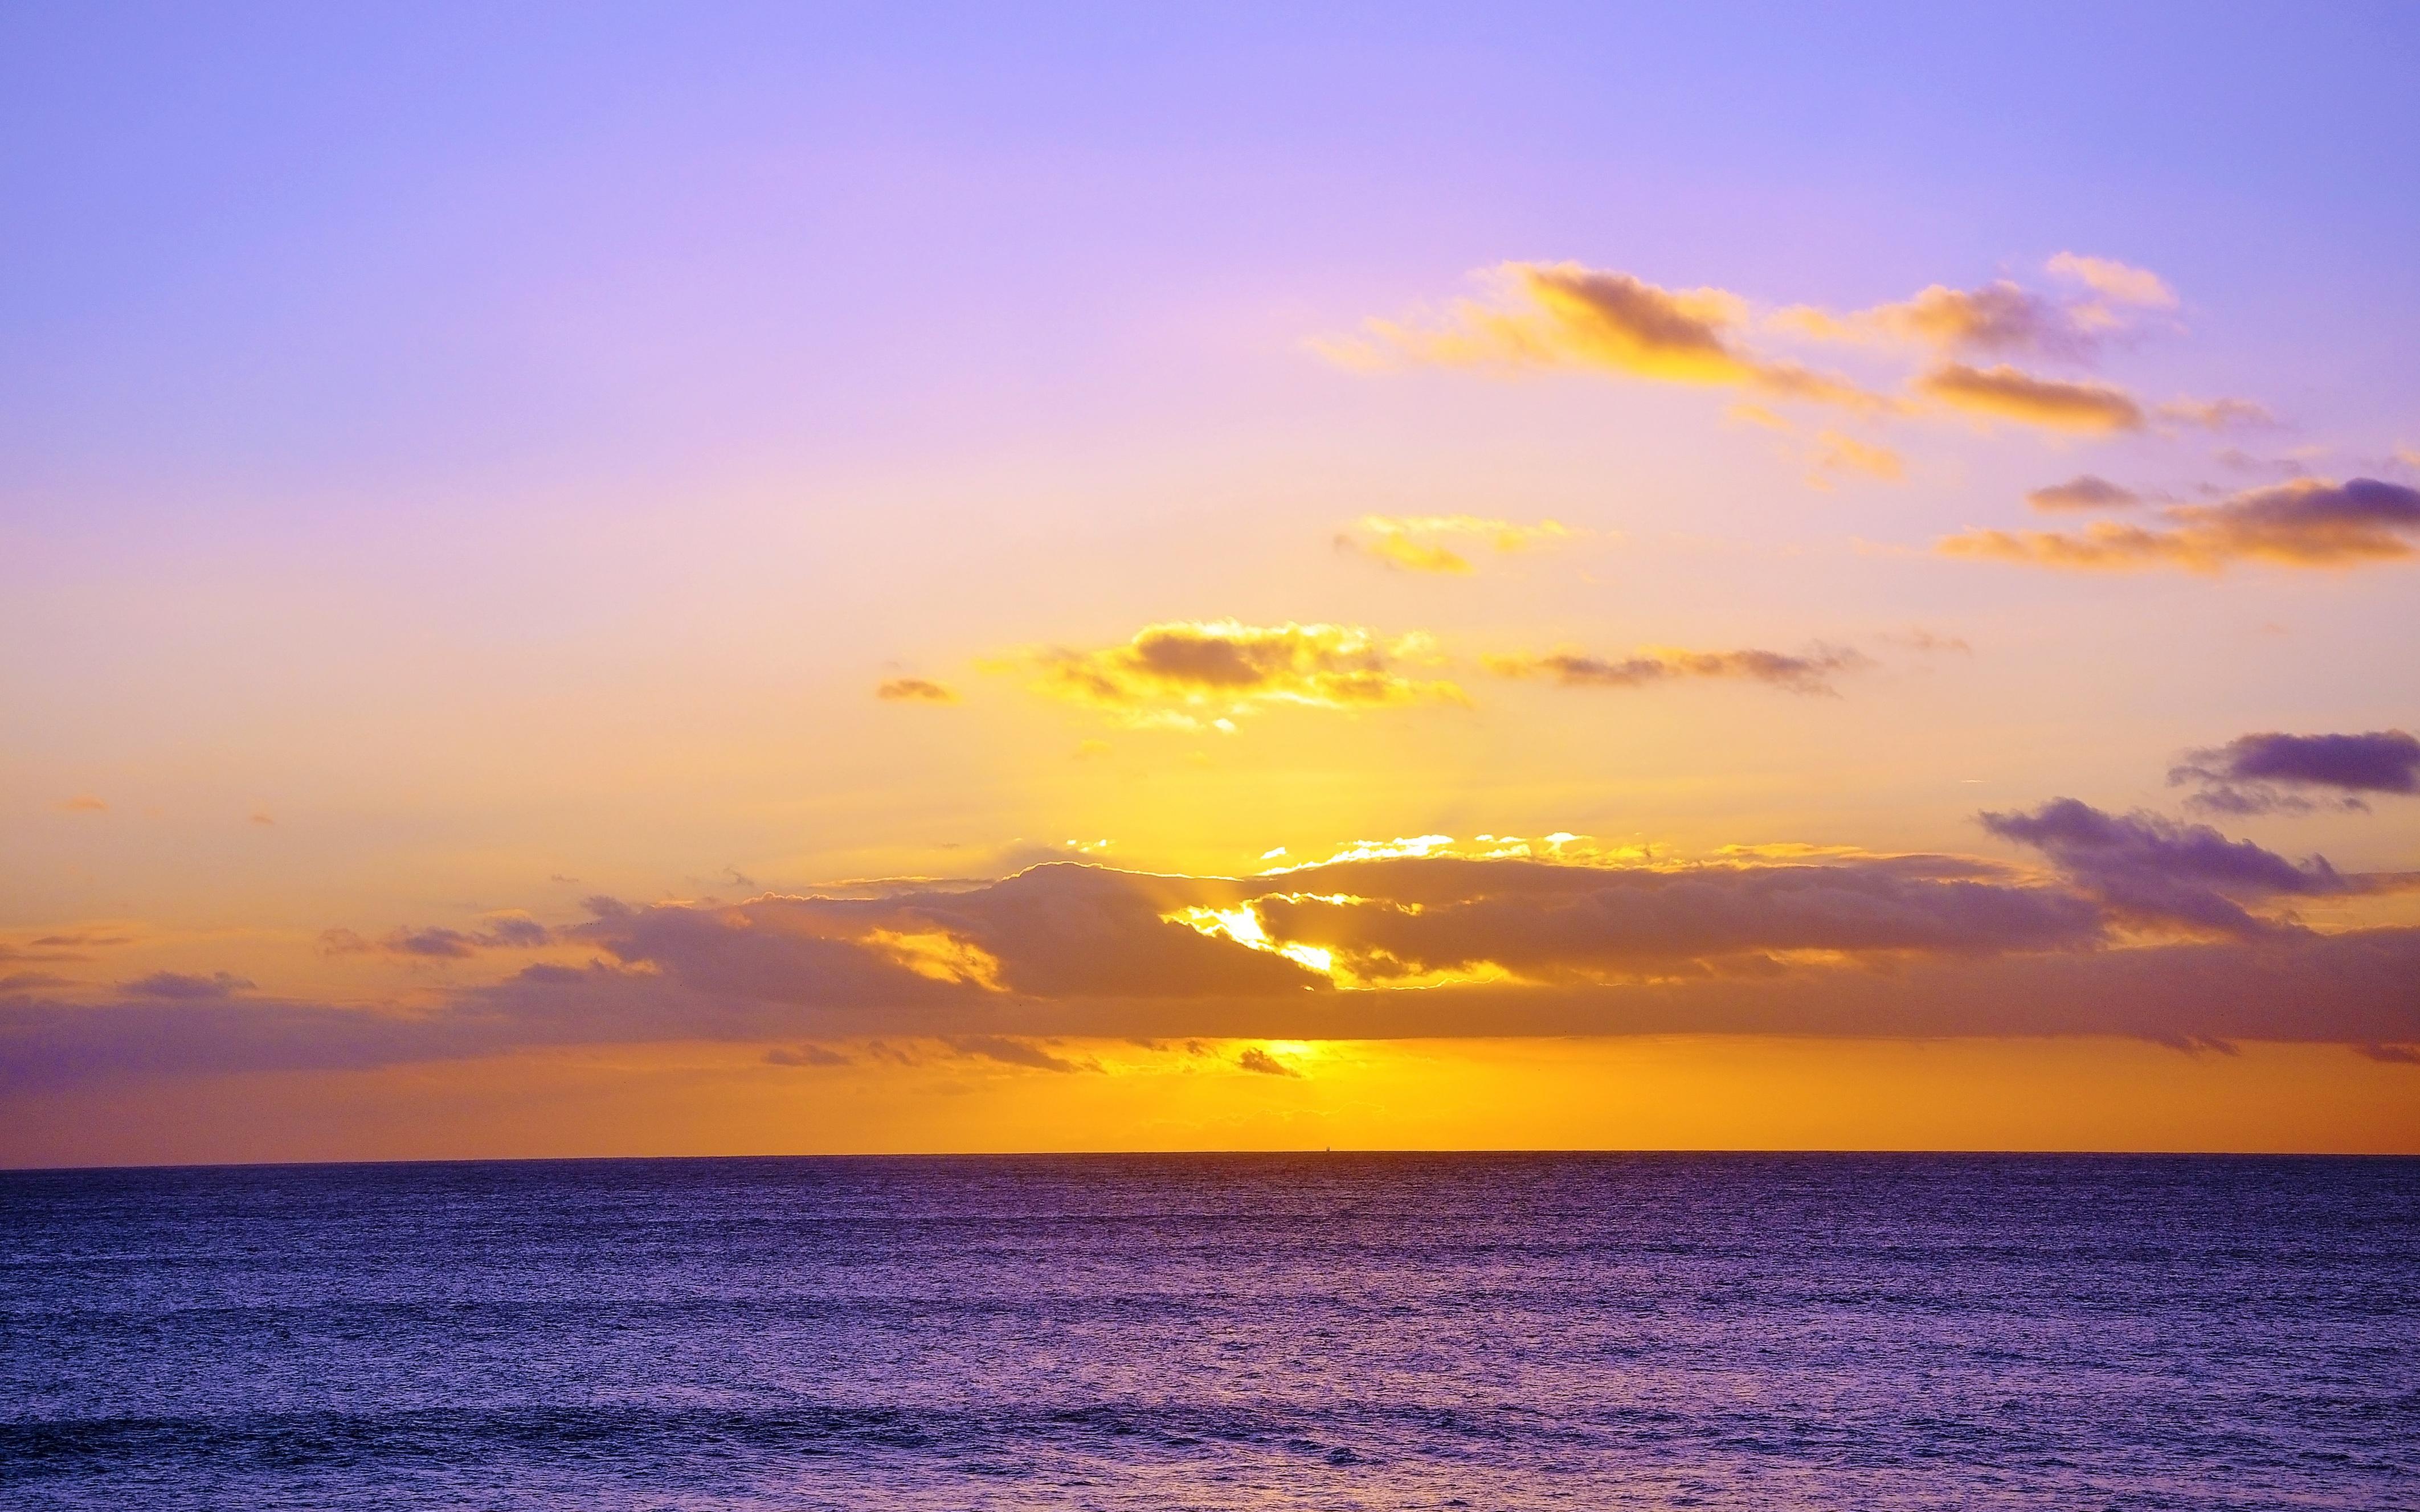 ocean sunset beautiful clouds 4k 1602504248 - Ocean Sunset Beautiful Clouds 4k - Ocean Sunset Beautiful Clouds 4k wallpapers